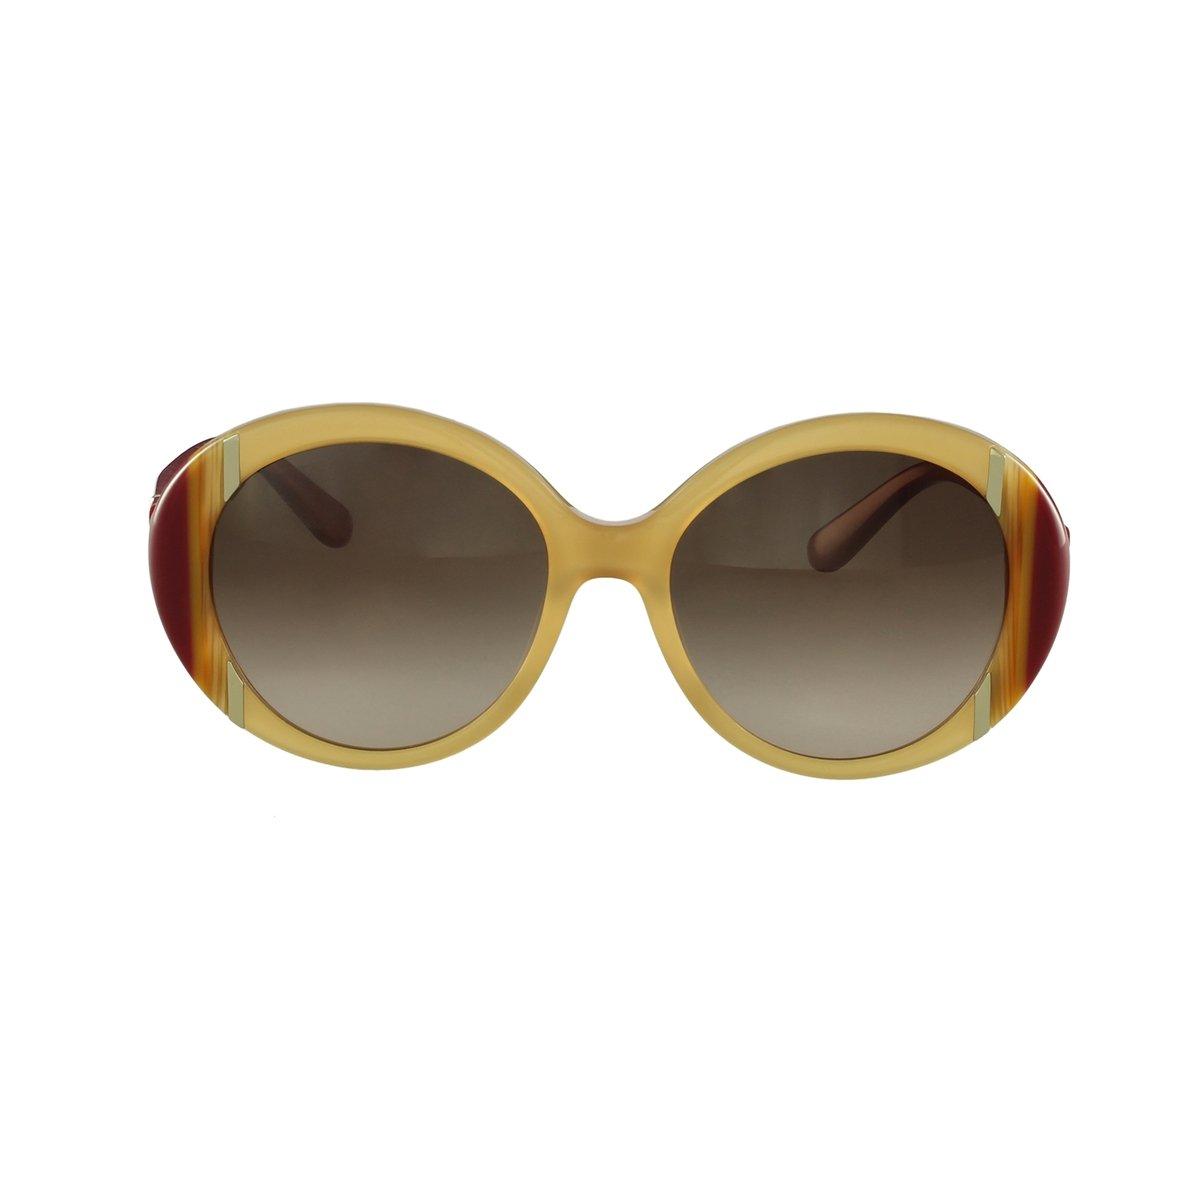 24d1719f0ac72 Óculos de Sol Salvatore Ferragamo Fashion Marrom - Compre Agora   Netshoes